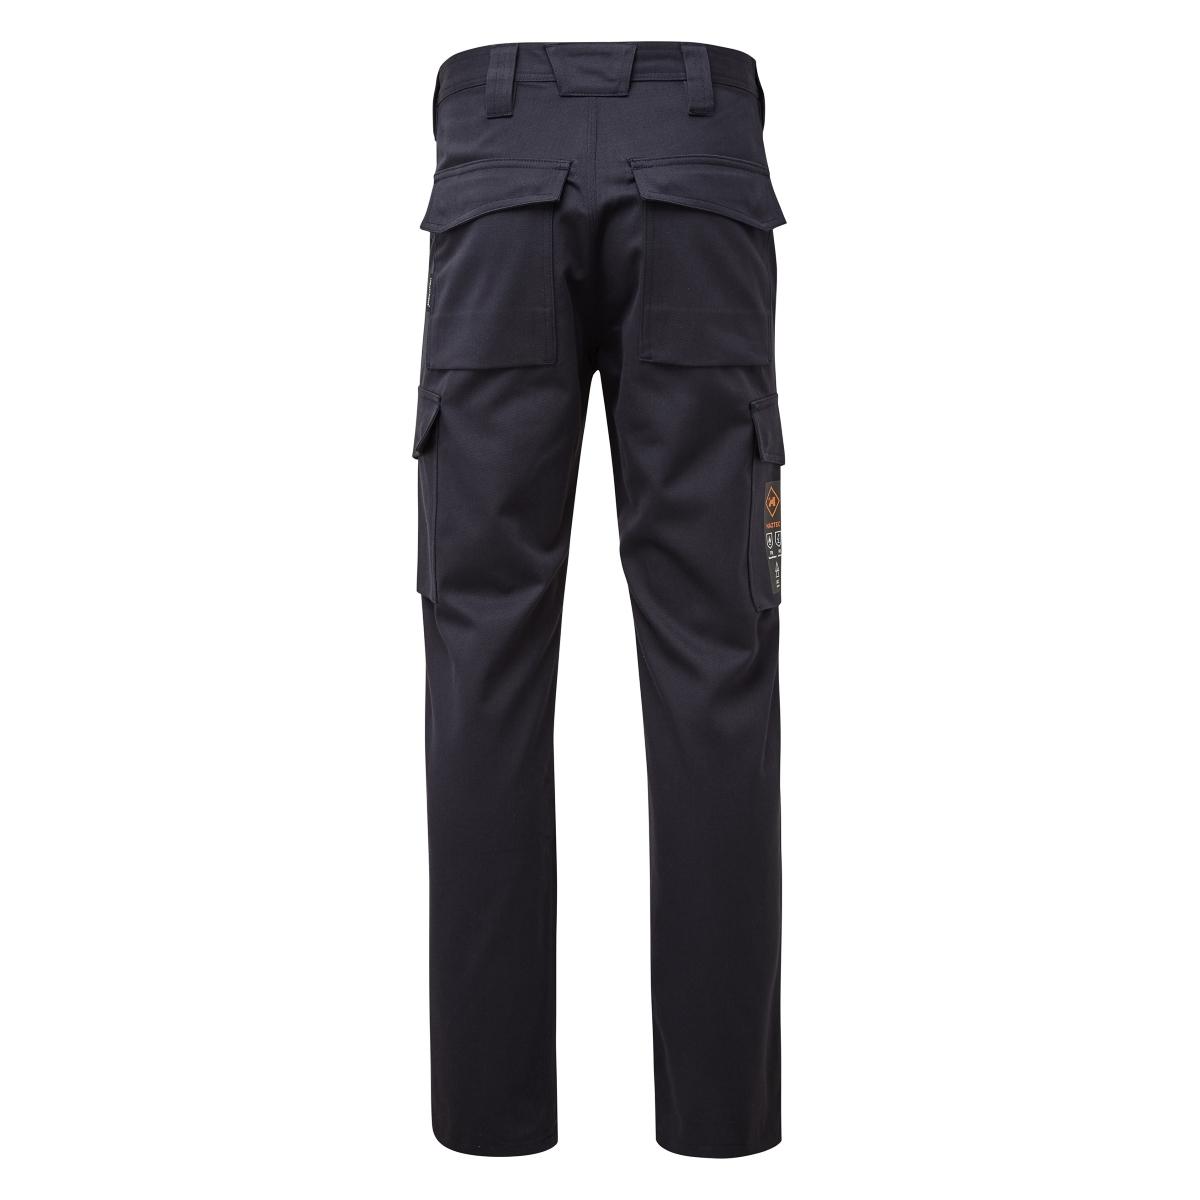 HAZTEC® Fife FR AS ARC Combat Trouser 300 gsm